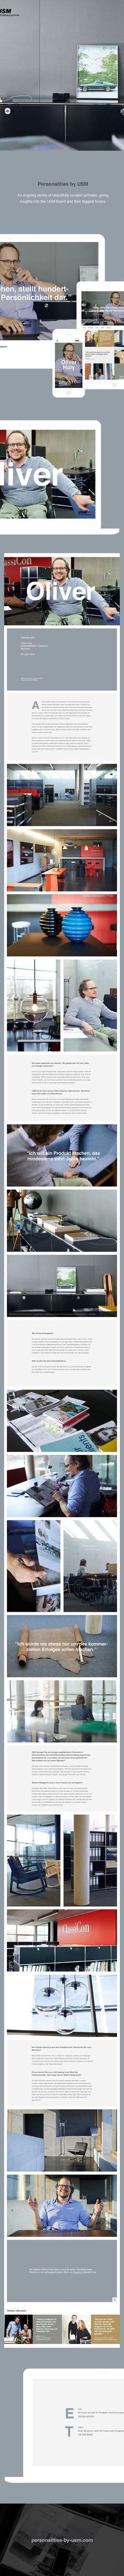 Personalities by USM by Stefan Schuster, via Behance